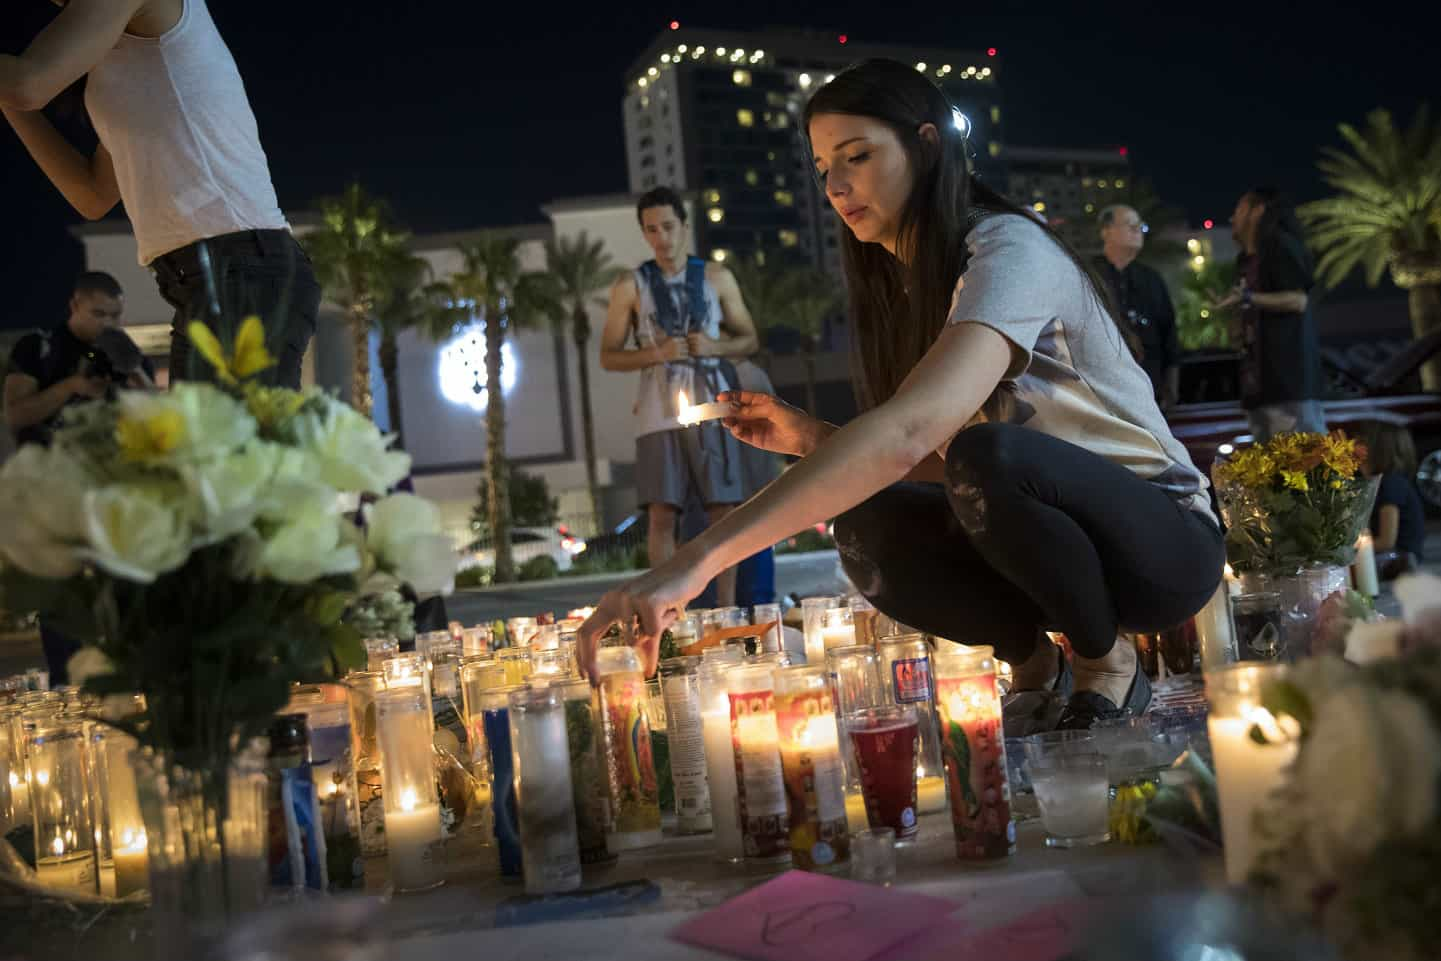 Homenaje a la víctimas del tiroteo de Las Vegas